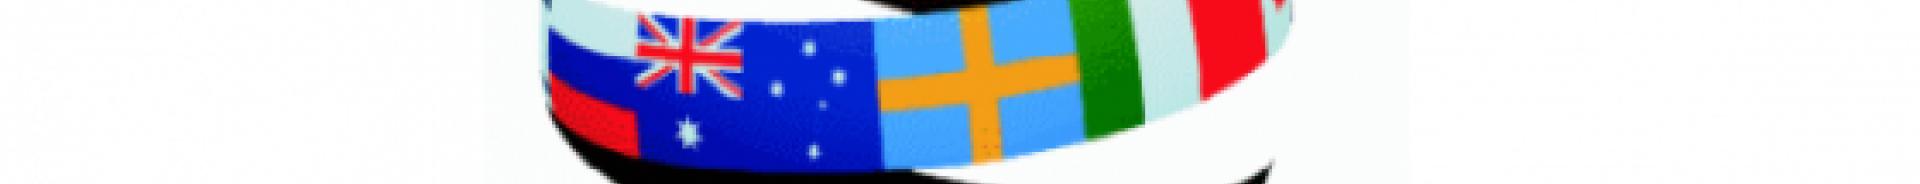 logo mibs